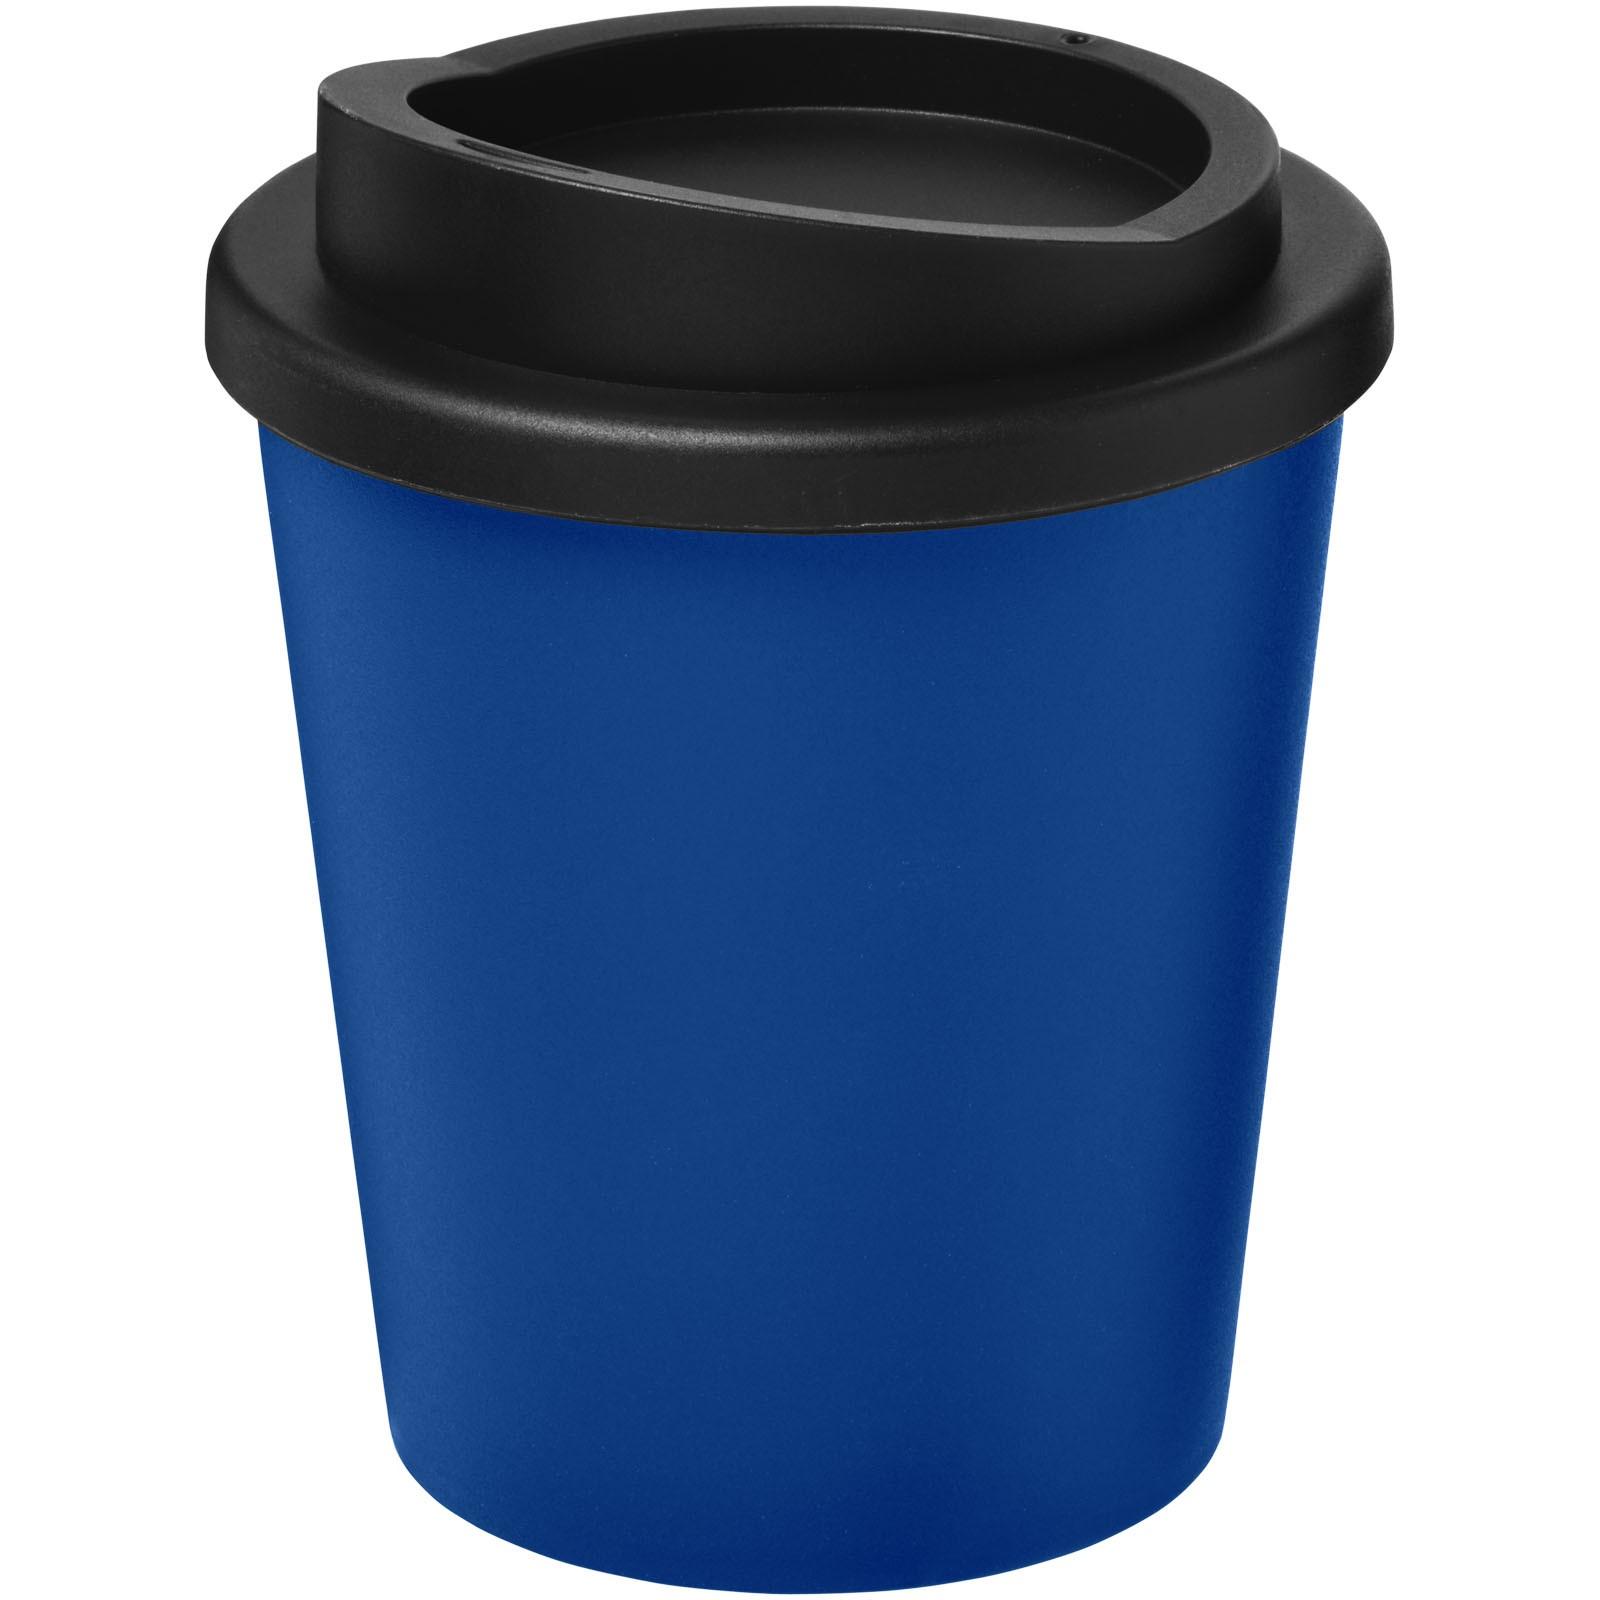 Americano® Vaso térmico Espresso de 250 ml - Azul / Negro intenso